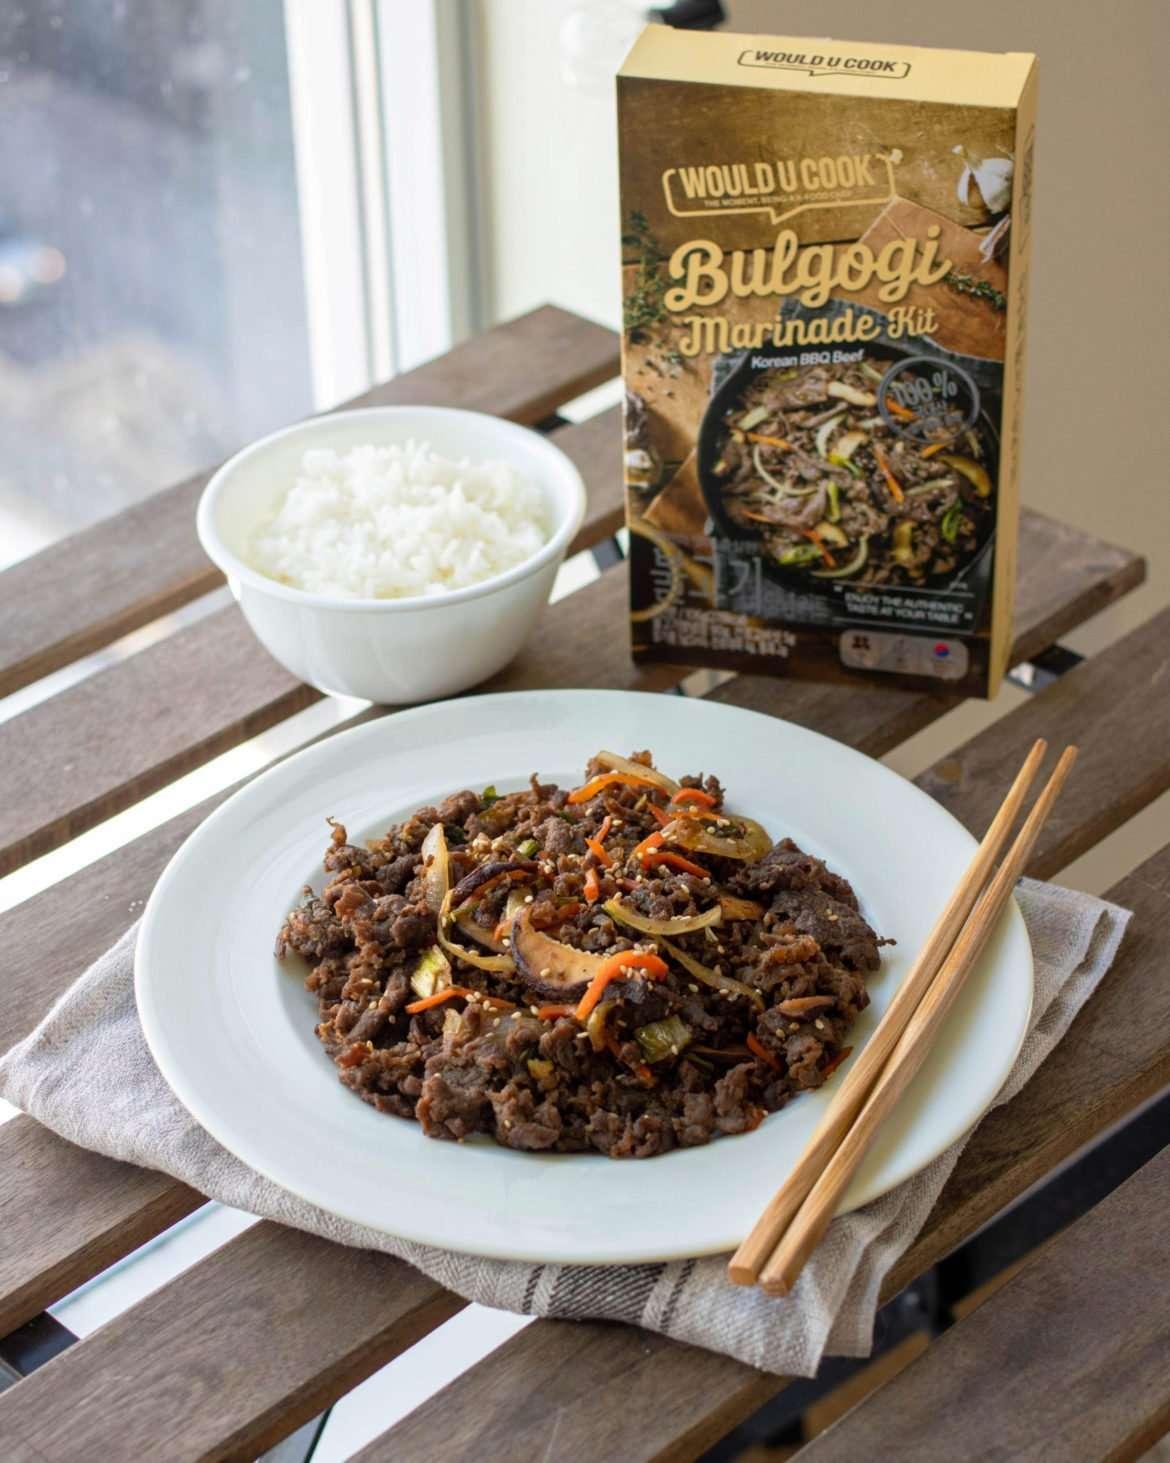 featured image of bulgogi made with woulducook kit